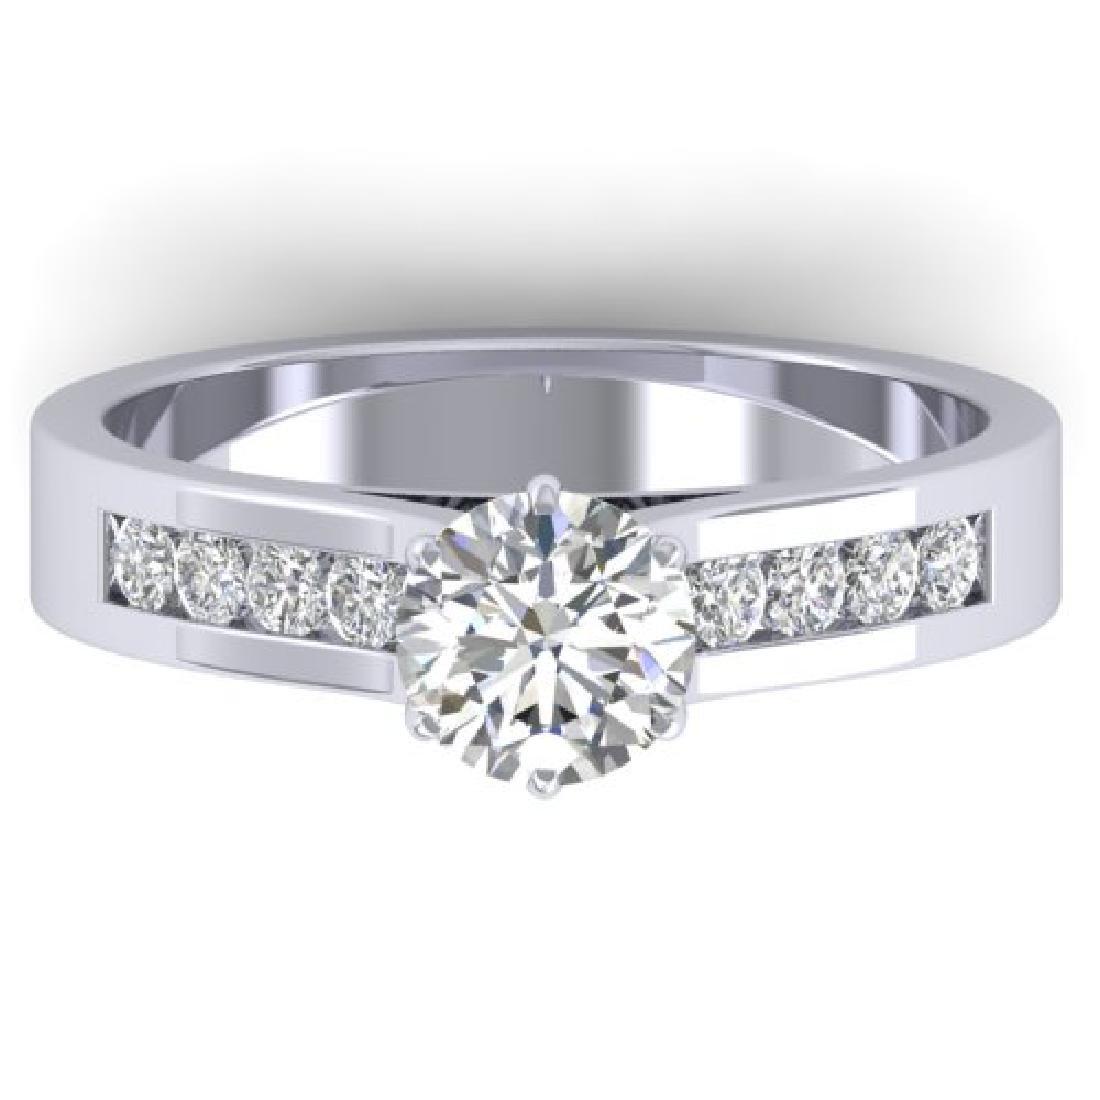 1.1 CTW Certified VS/SI Diamond Solitaire Art Deco Ring